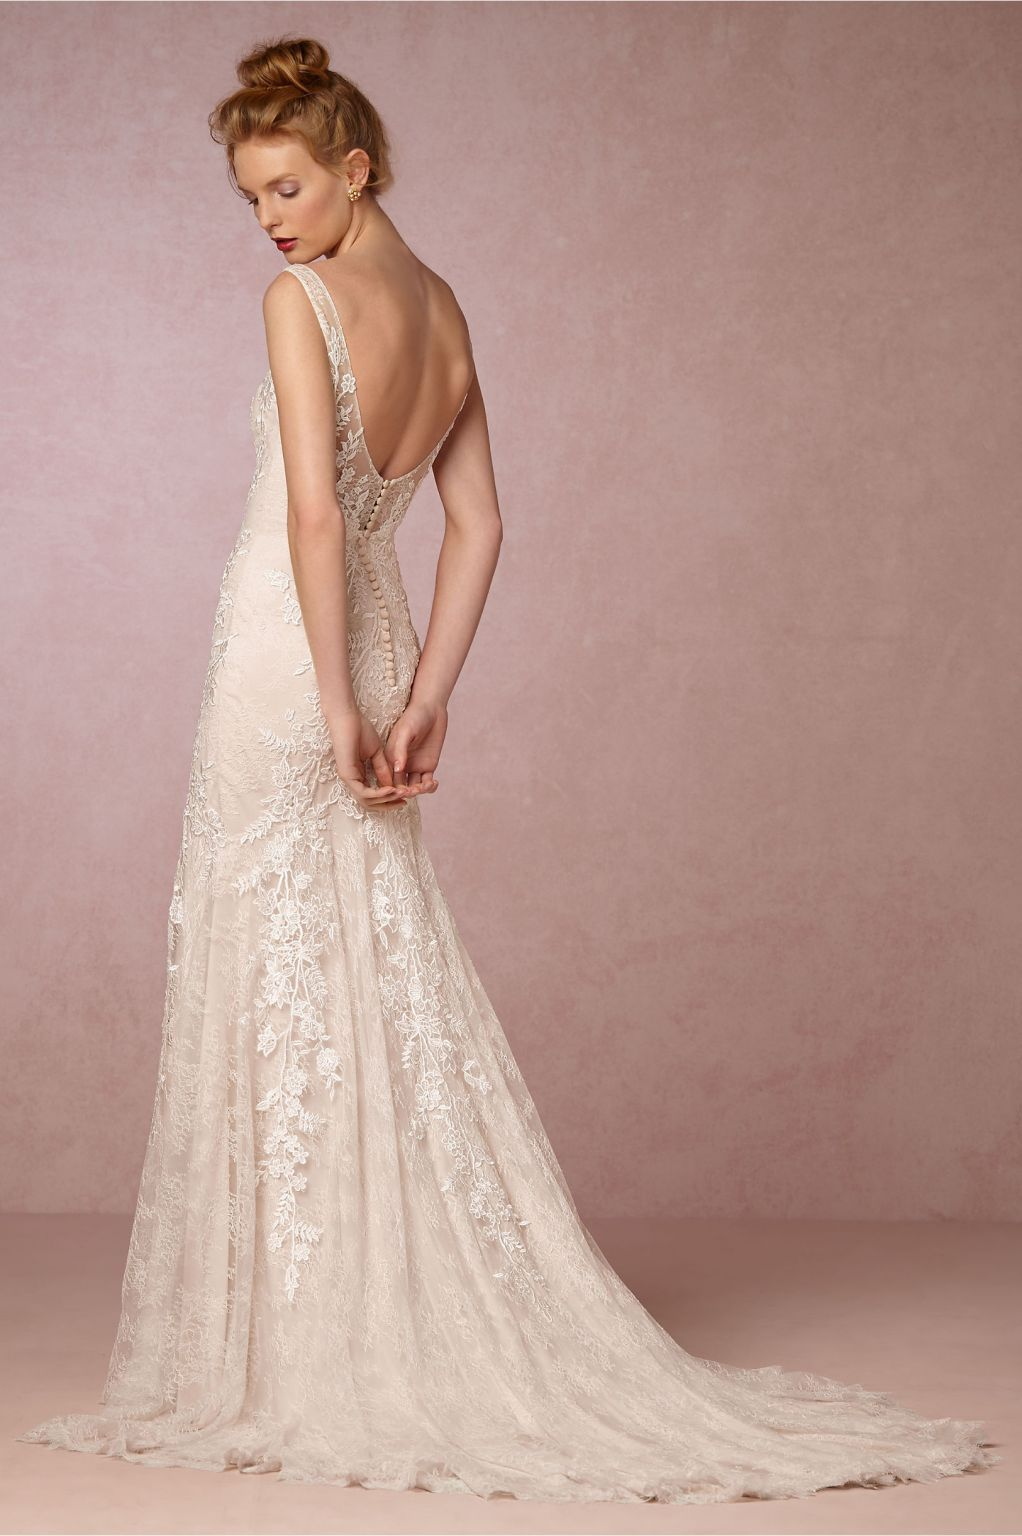 Wedding Dress Resale.Bhldn Elisha Gown 1 300 Size 10 Used Wedding Dresses In